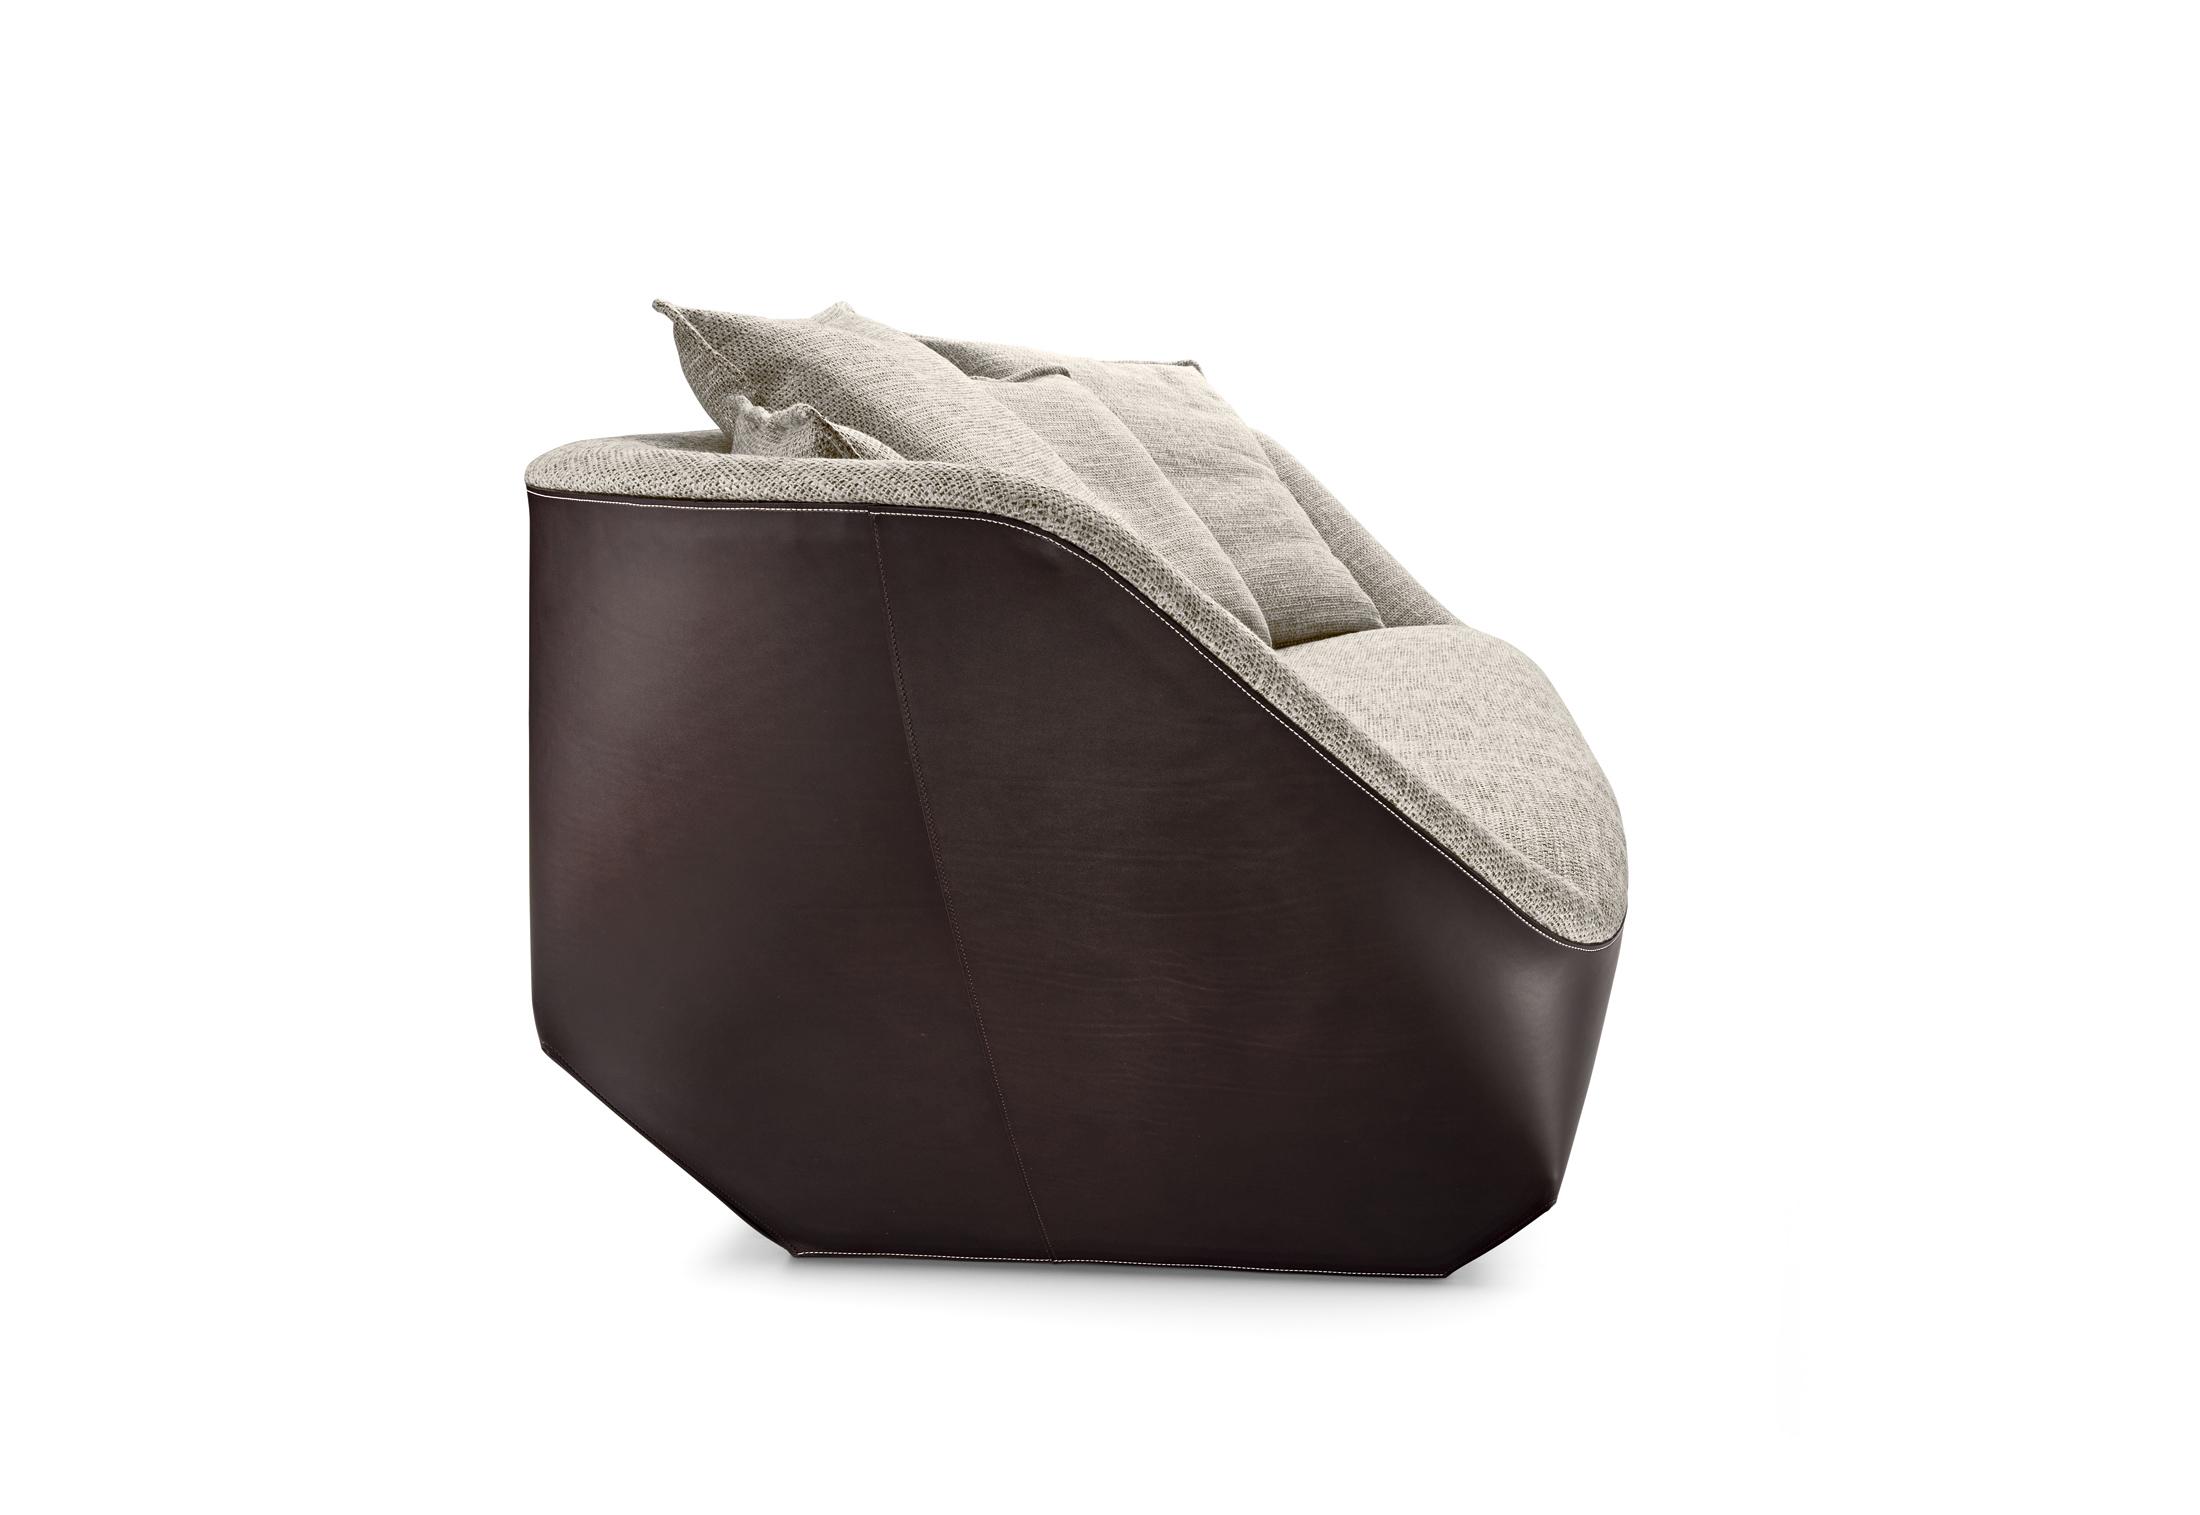 Isanka Sofa by EOOS for Walter Knoll